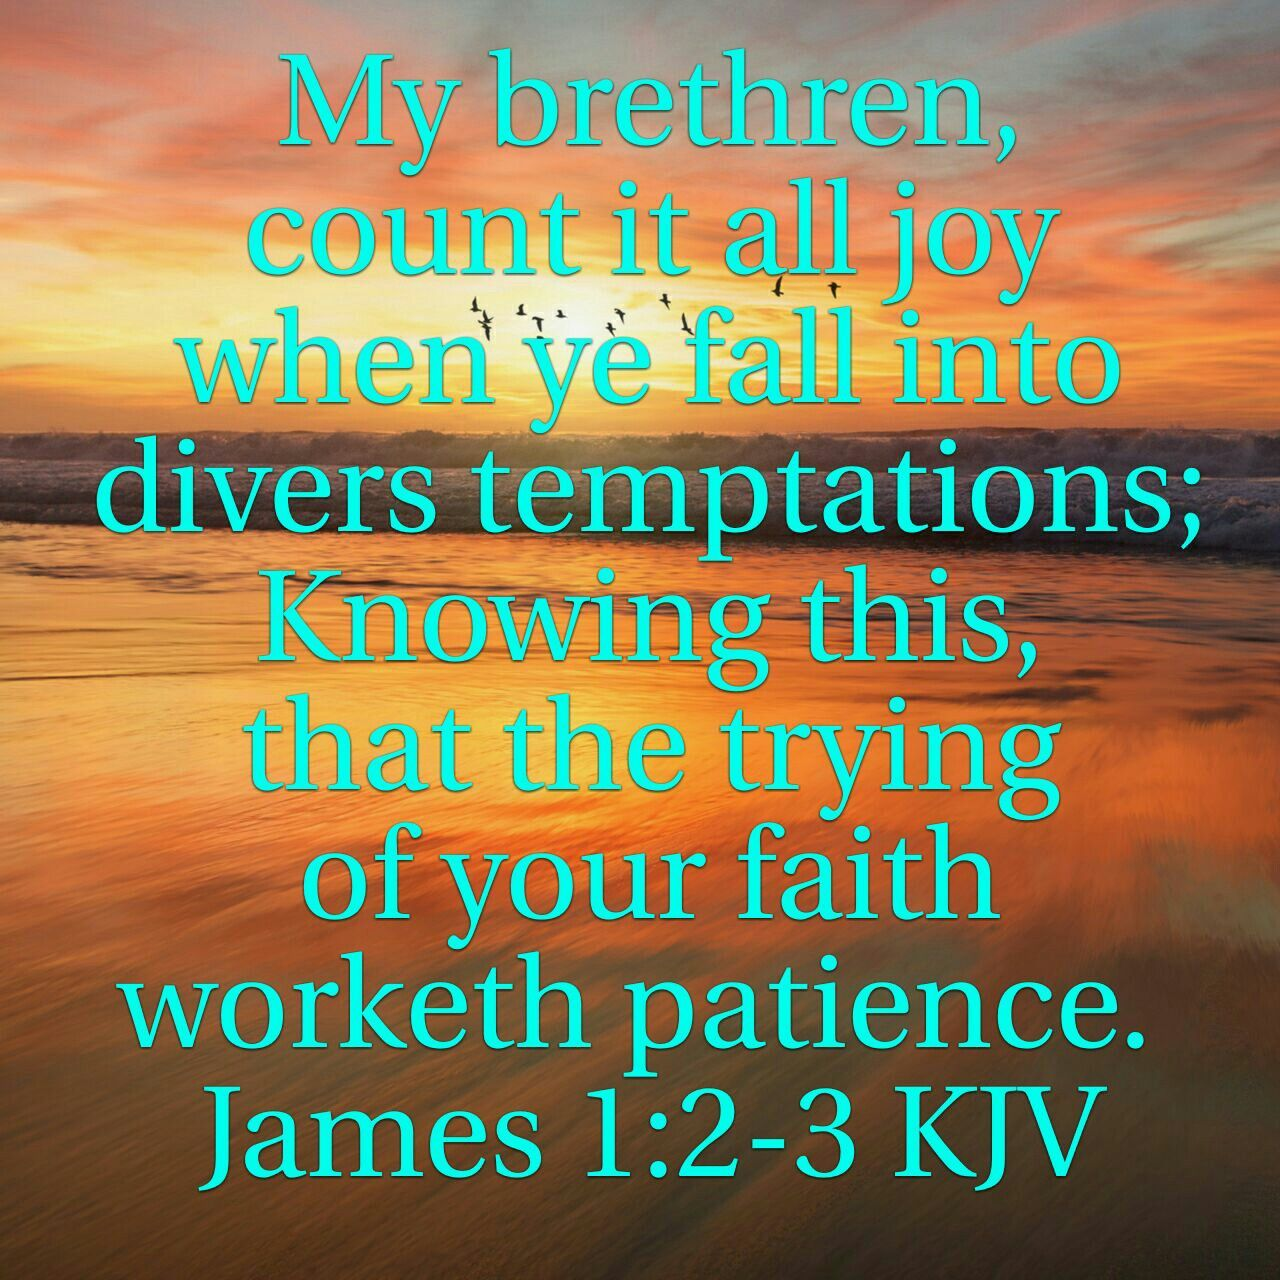 James 1 2 3 Kjv With Images Bible Quotes Kjv Bible Quotes Kjv